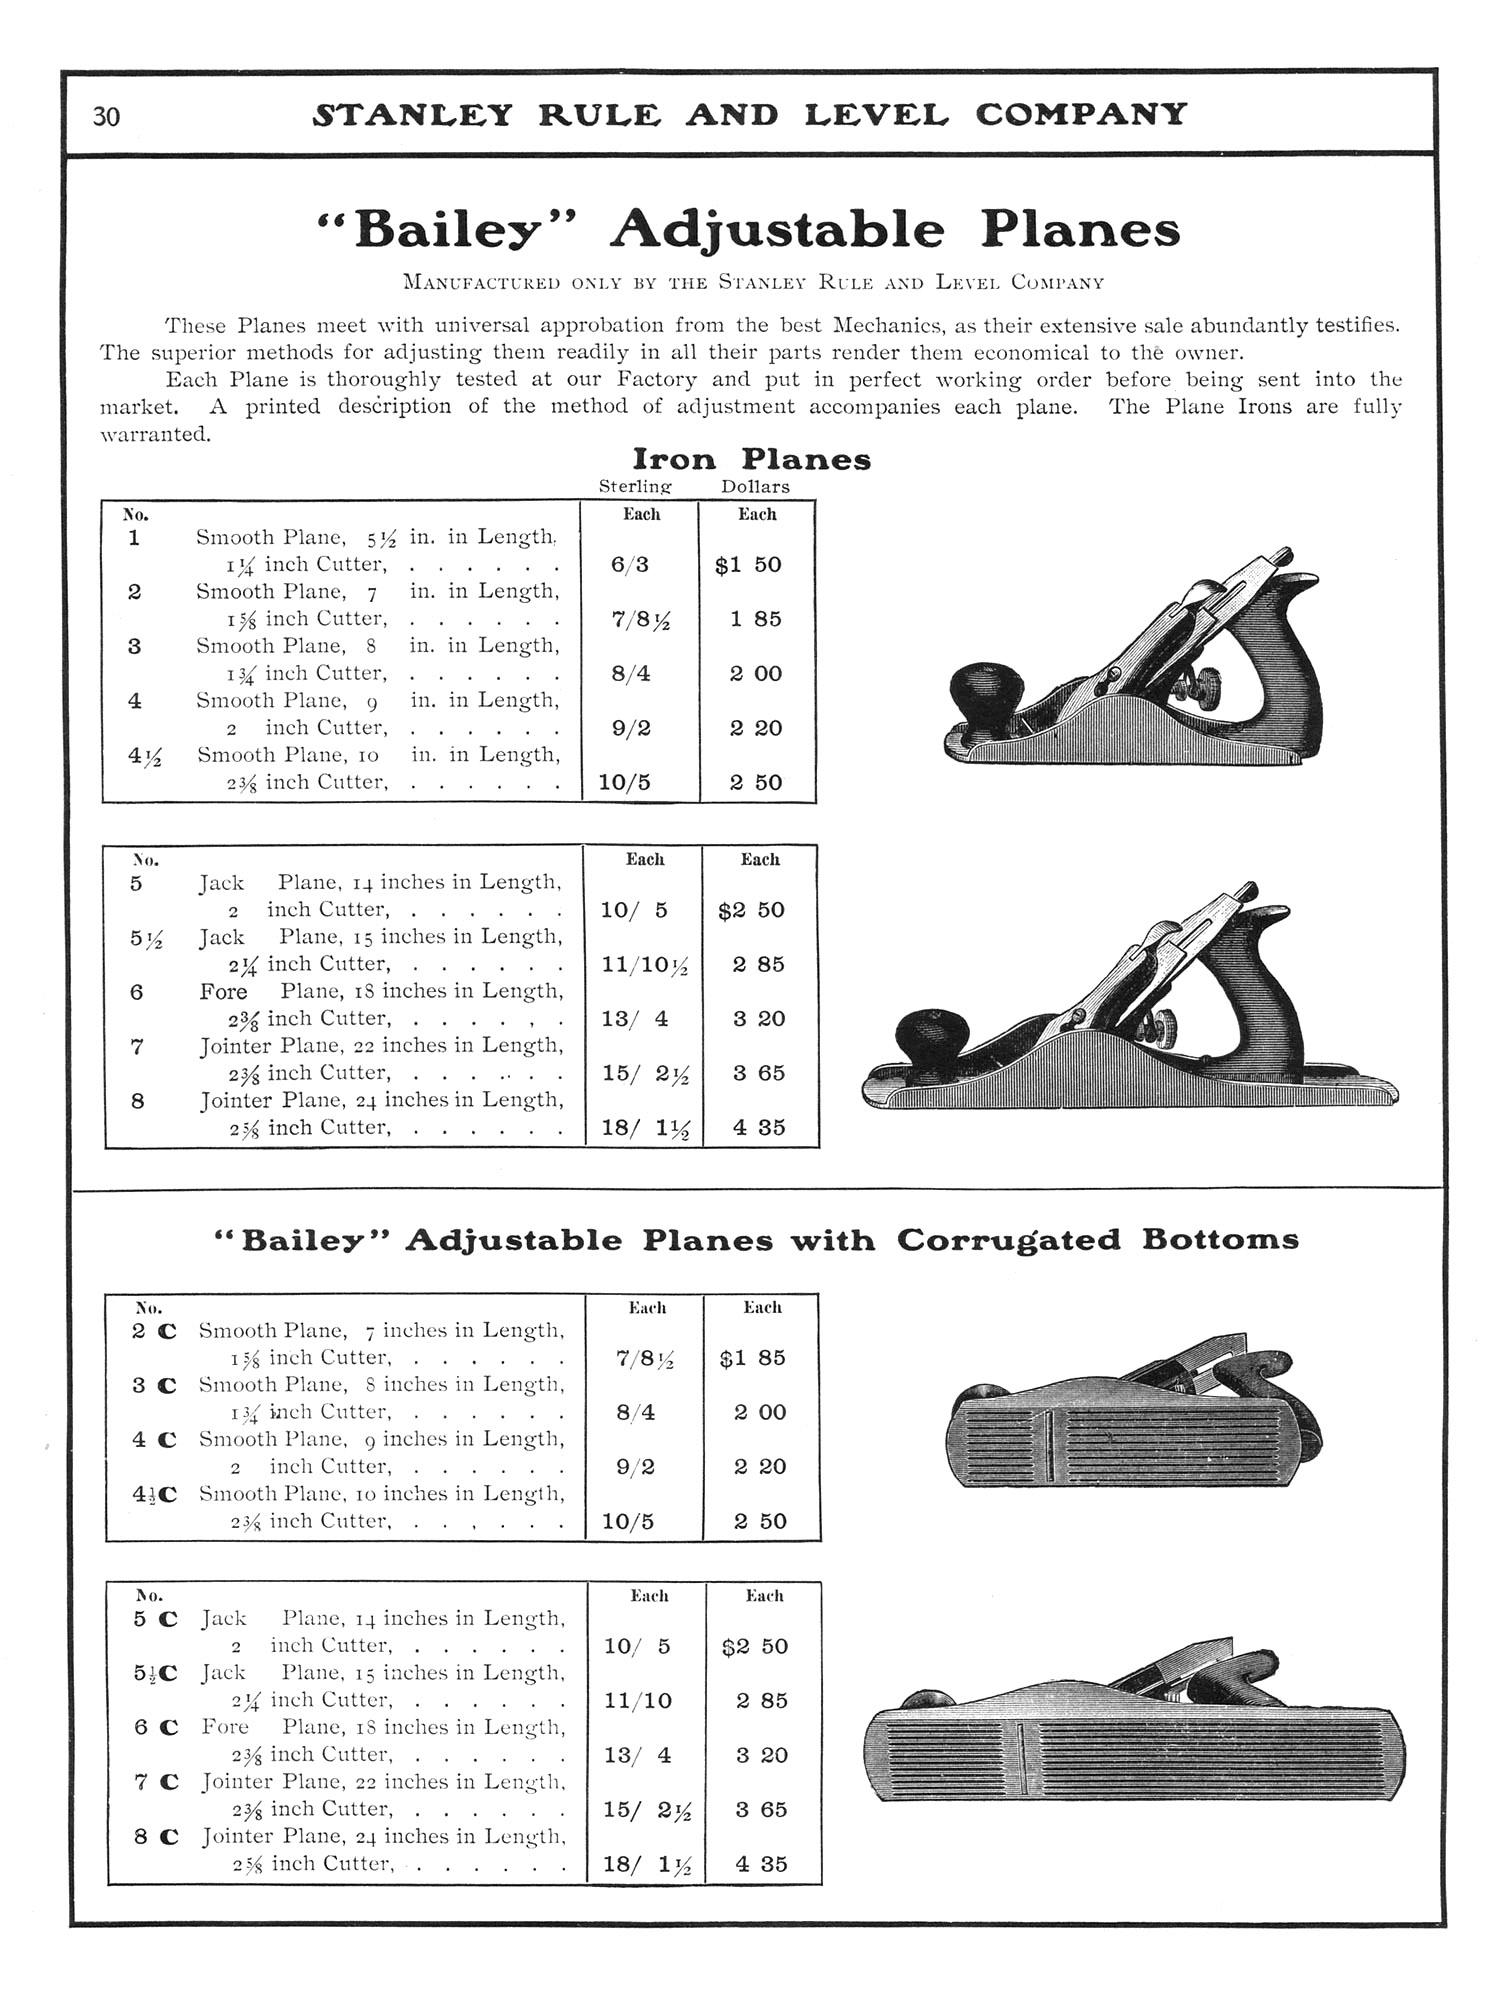 Stanley 1902 Catalog  Handplane Central